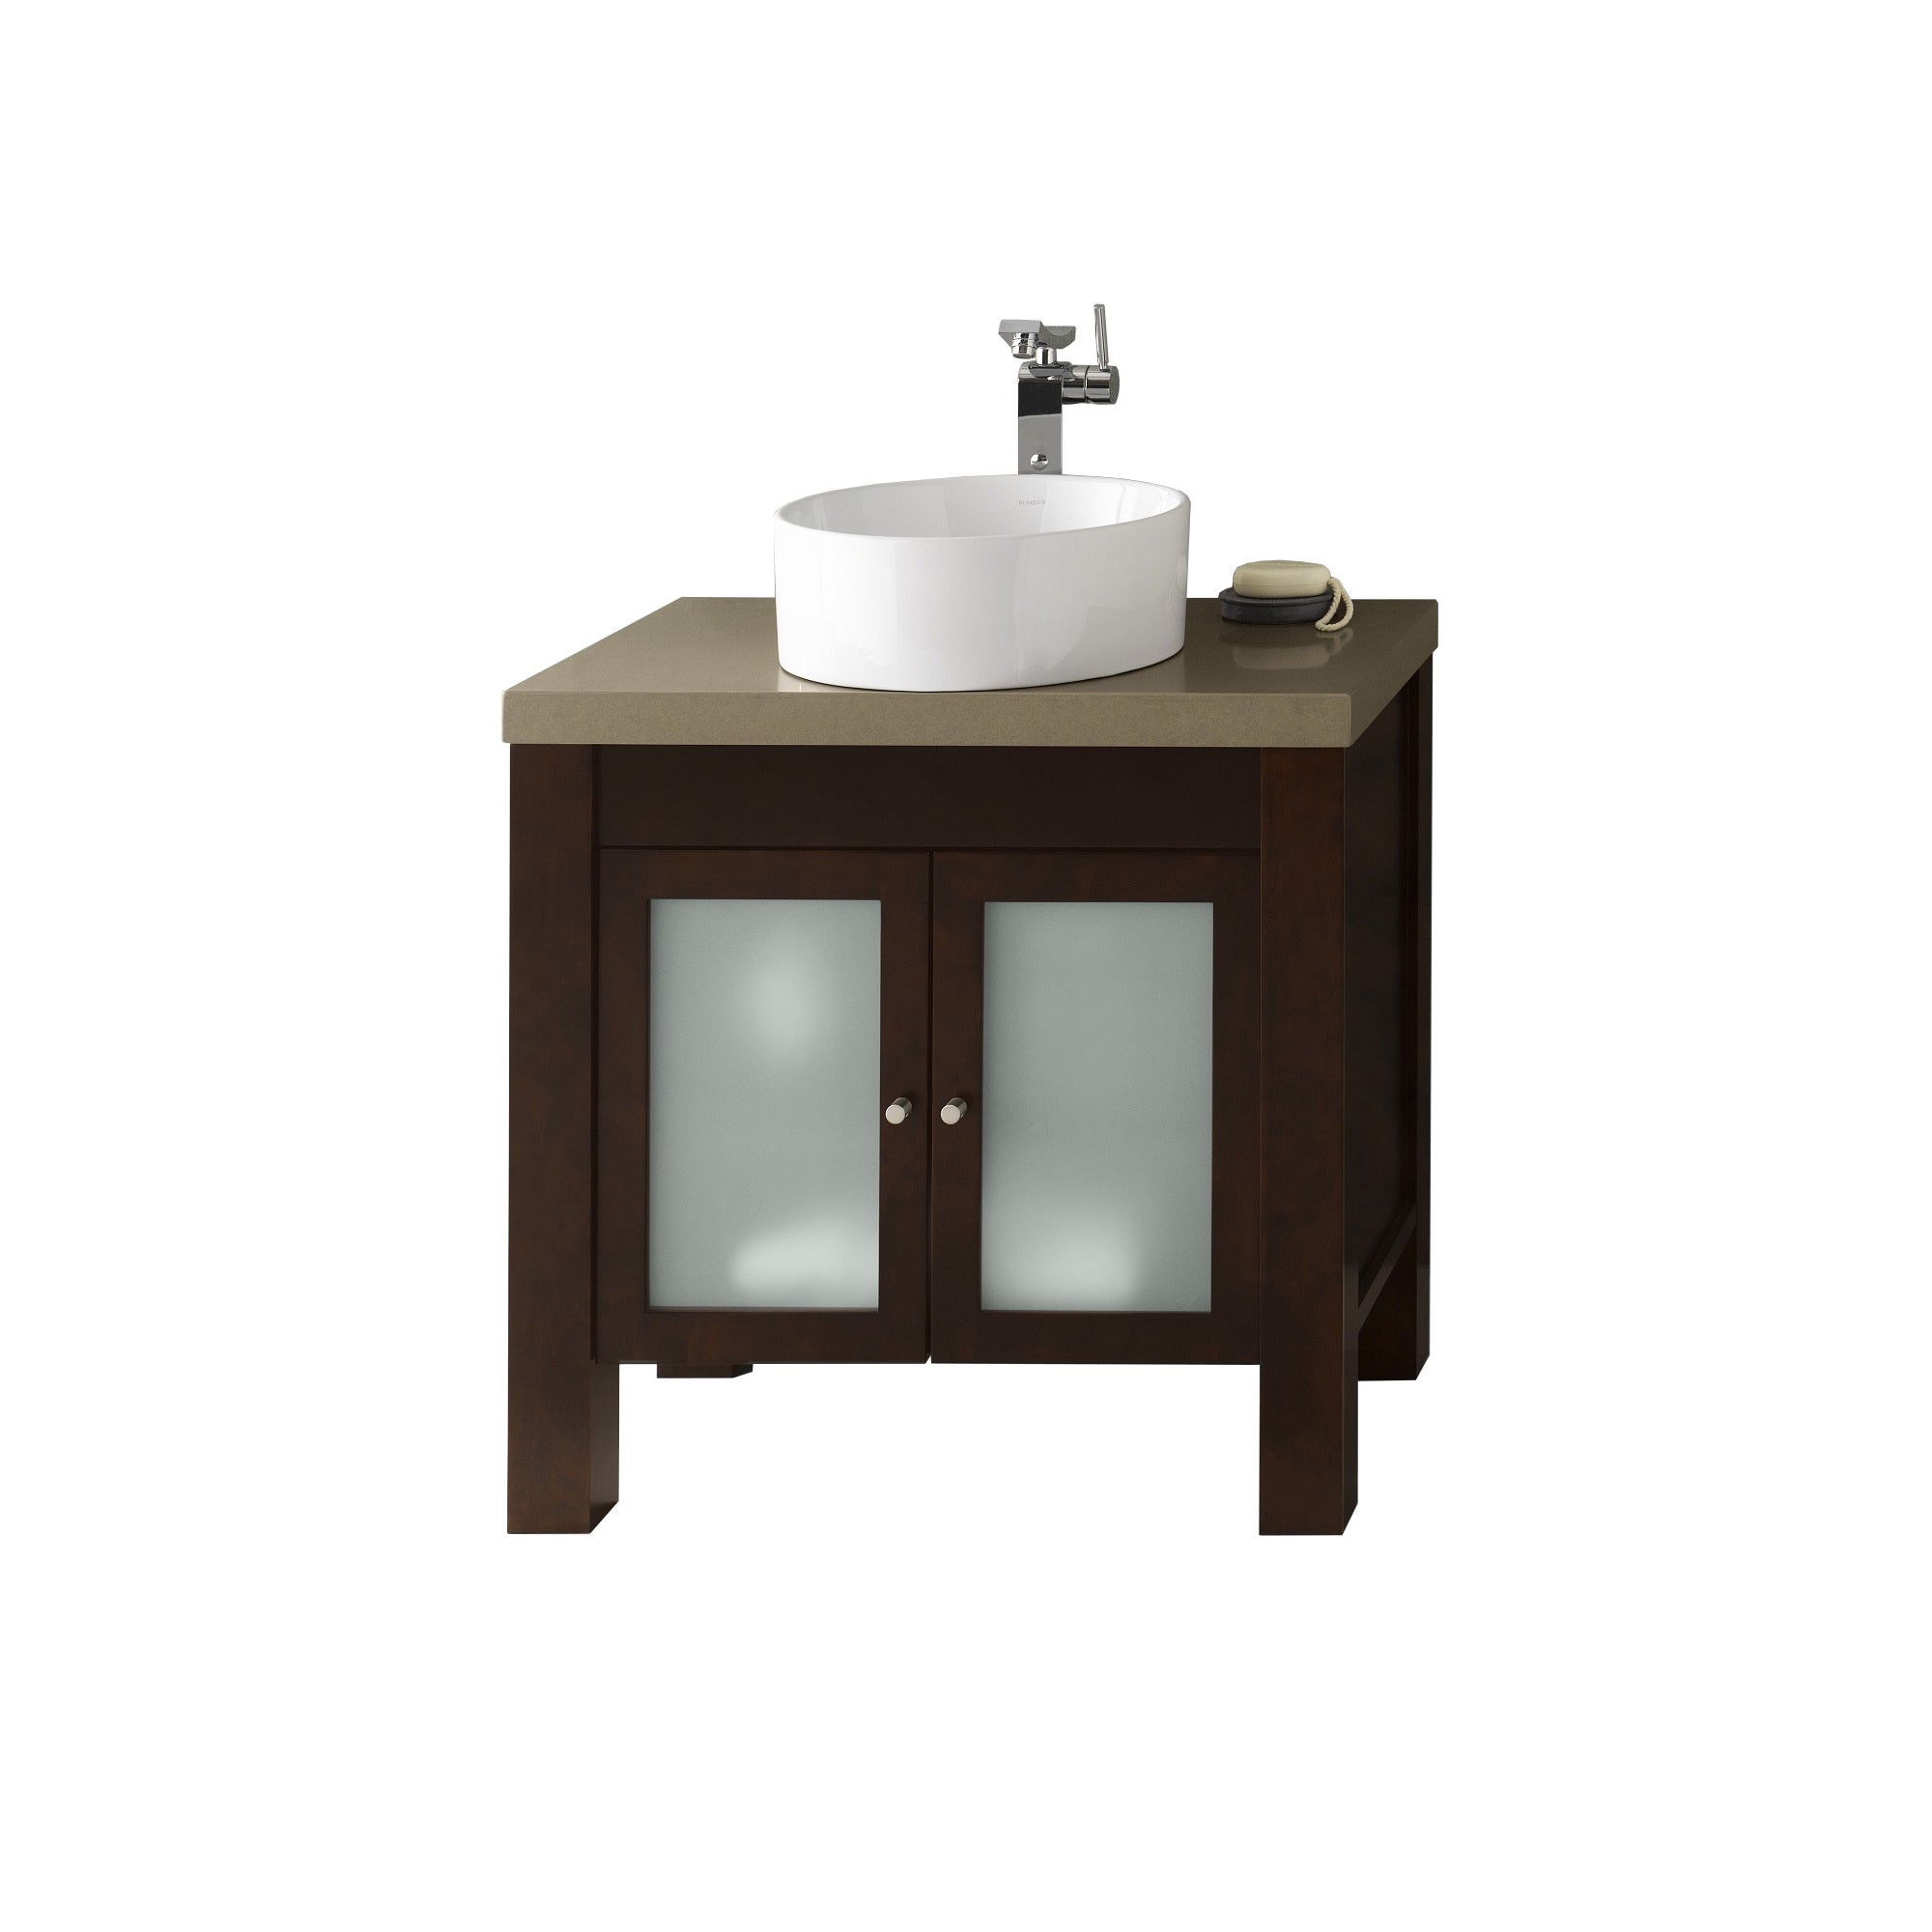 Shop Ronbow Devon 31-inch Bathroom Vanity Set in Vintage Walnut ...